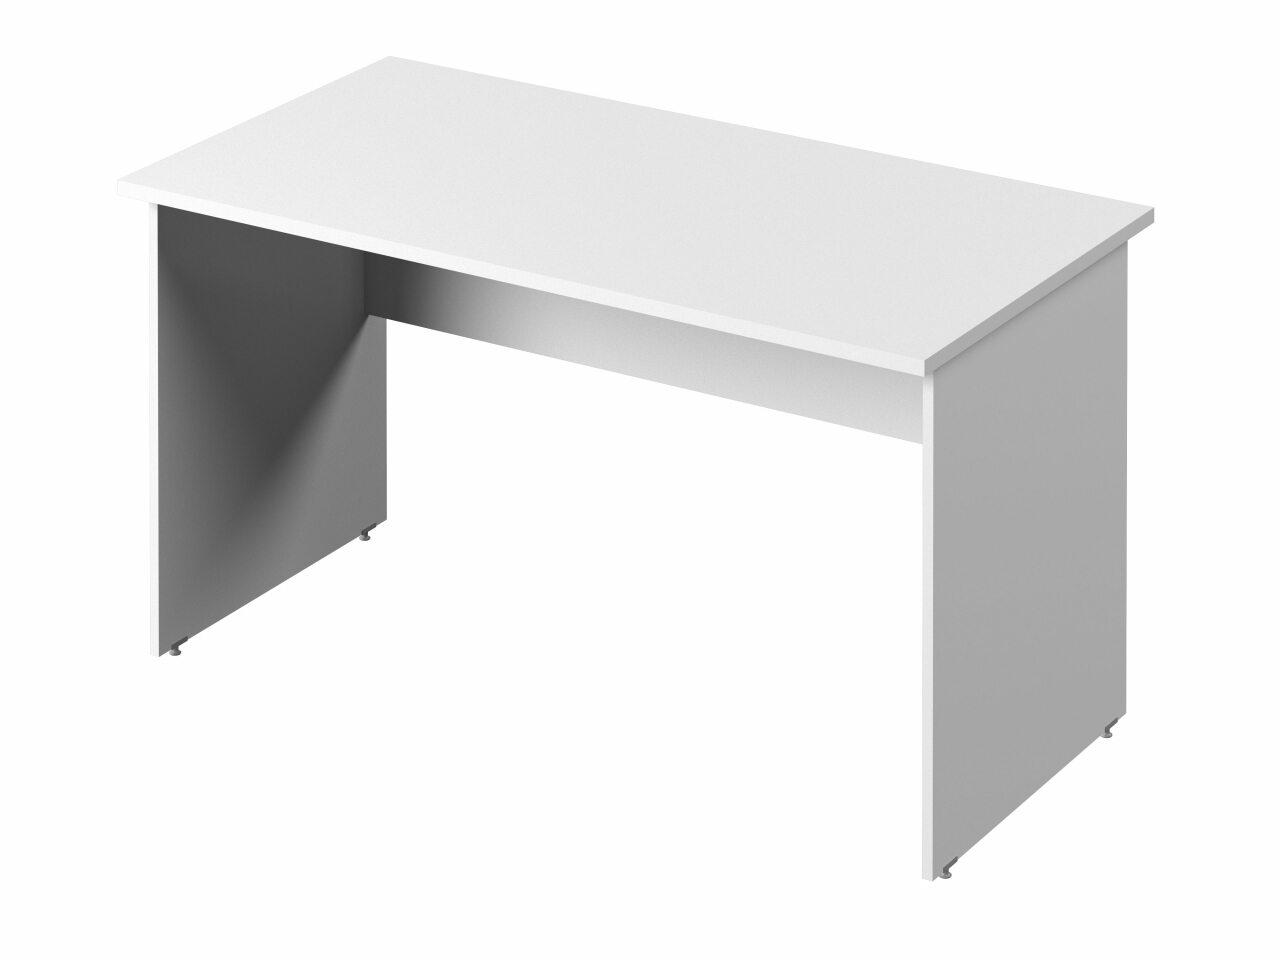 Стол прямой с опорами из ЛДСП  Public Comfort 135x70x74 - фото 1